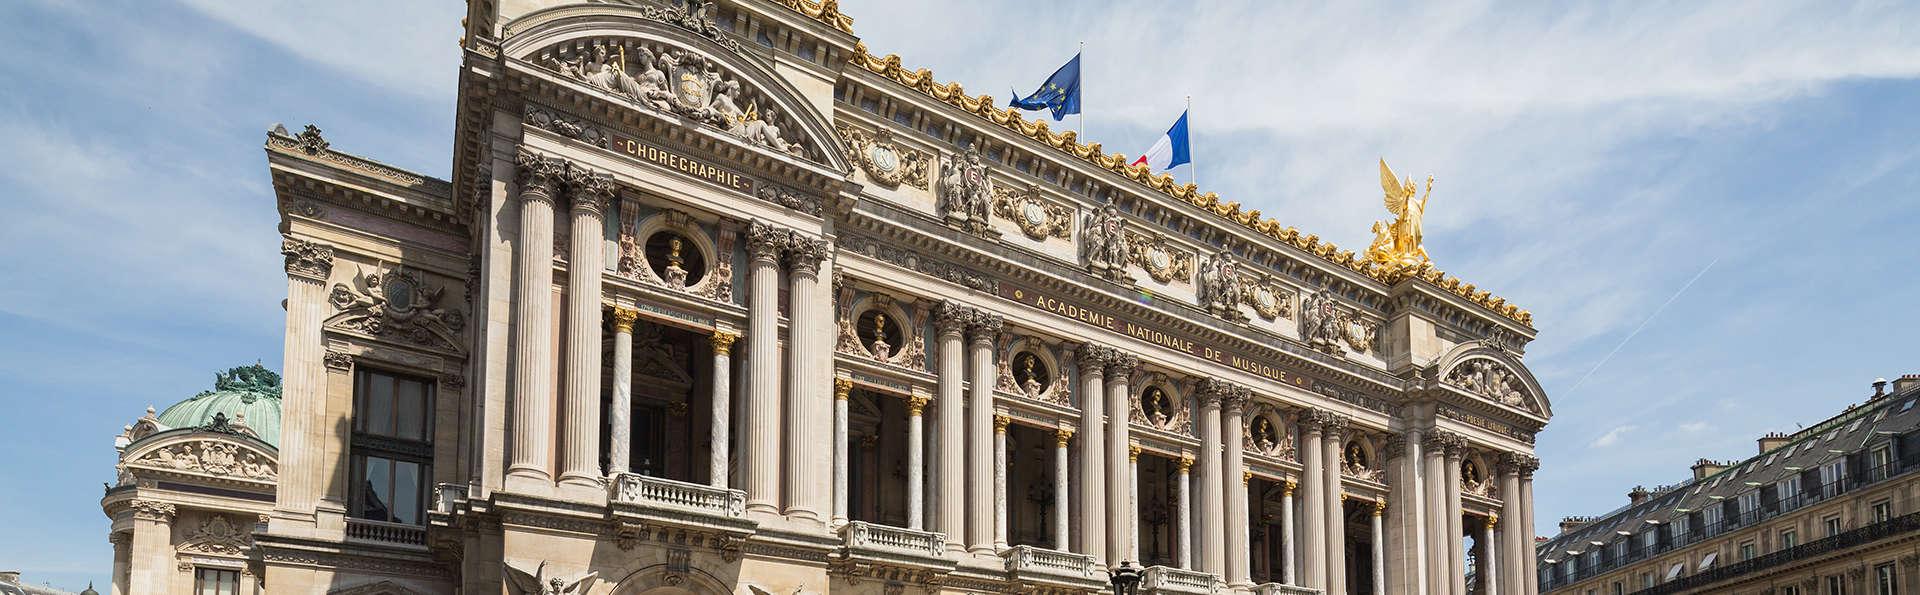 Week-end avec visite guidée de l'Opéra Garnier